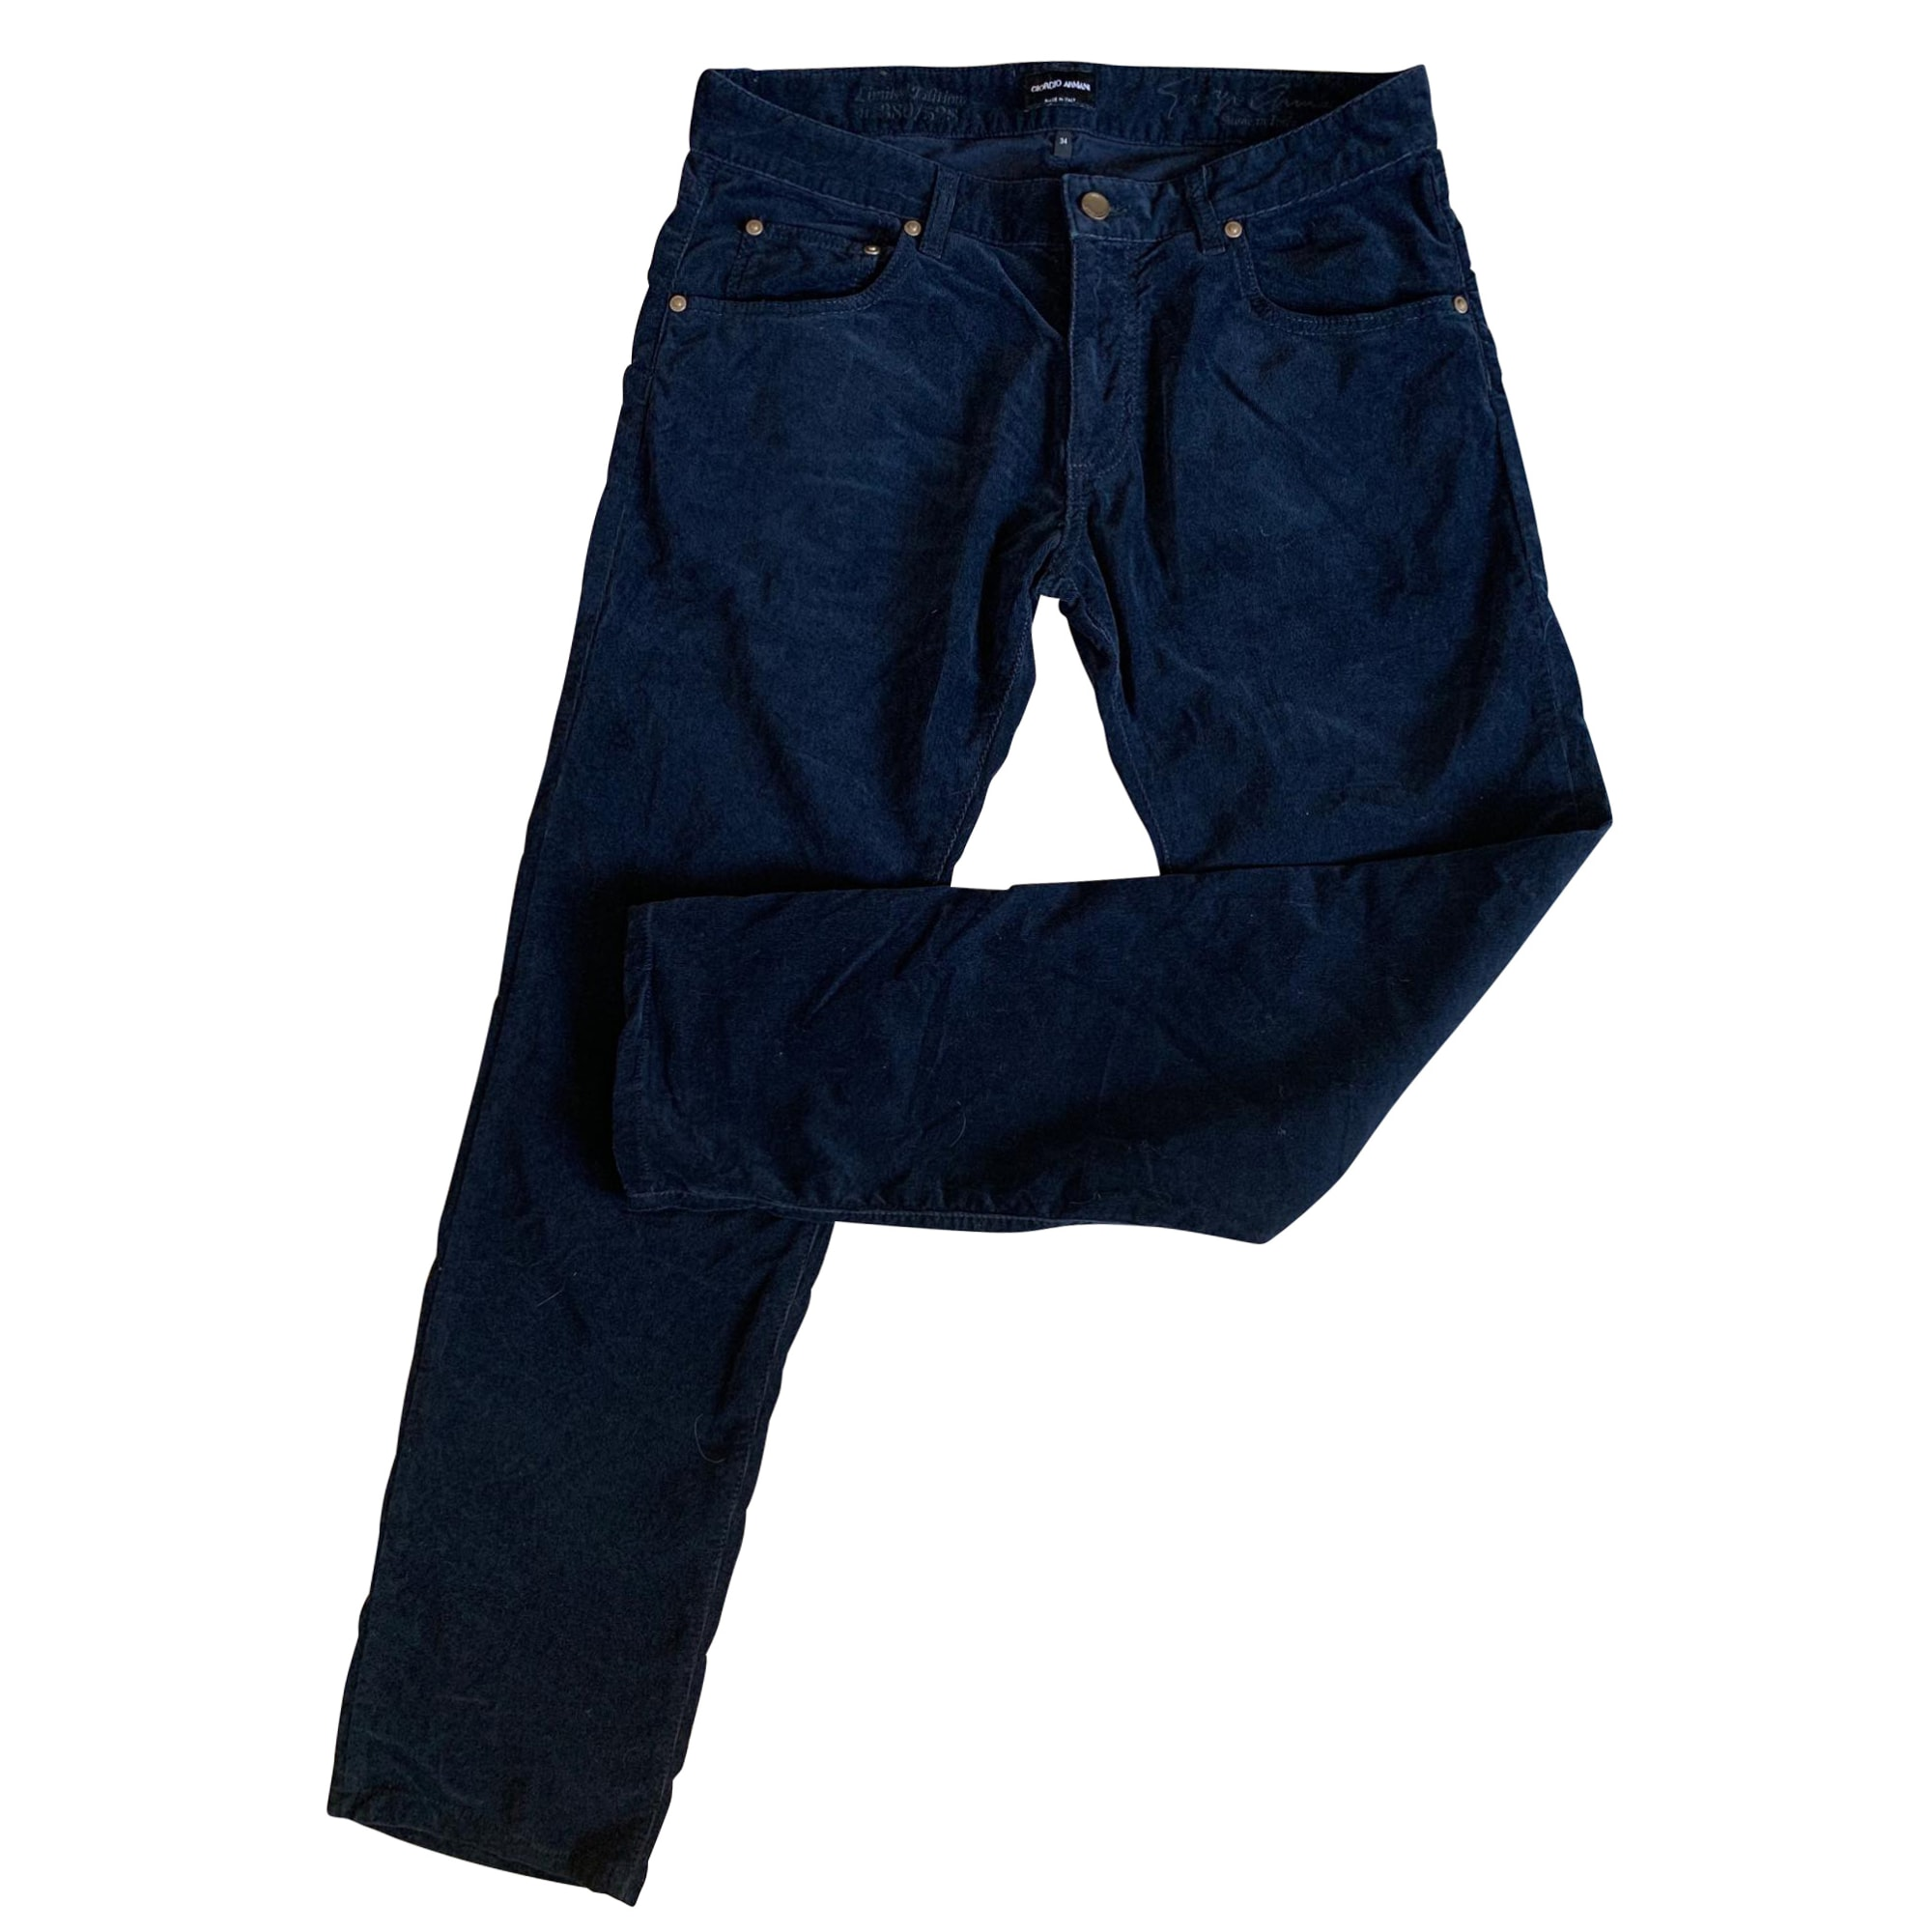 Pantalon droit GIORGIO ARMANI Bleu, bleu marine, bleu turquoise